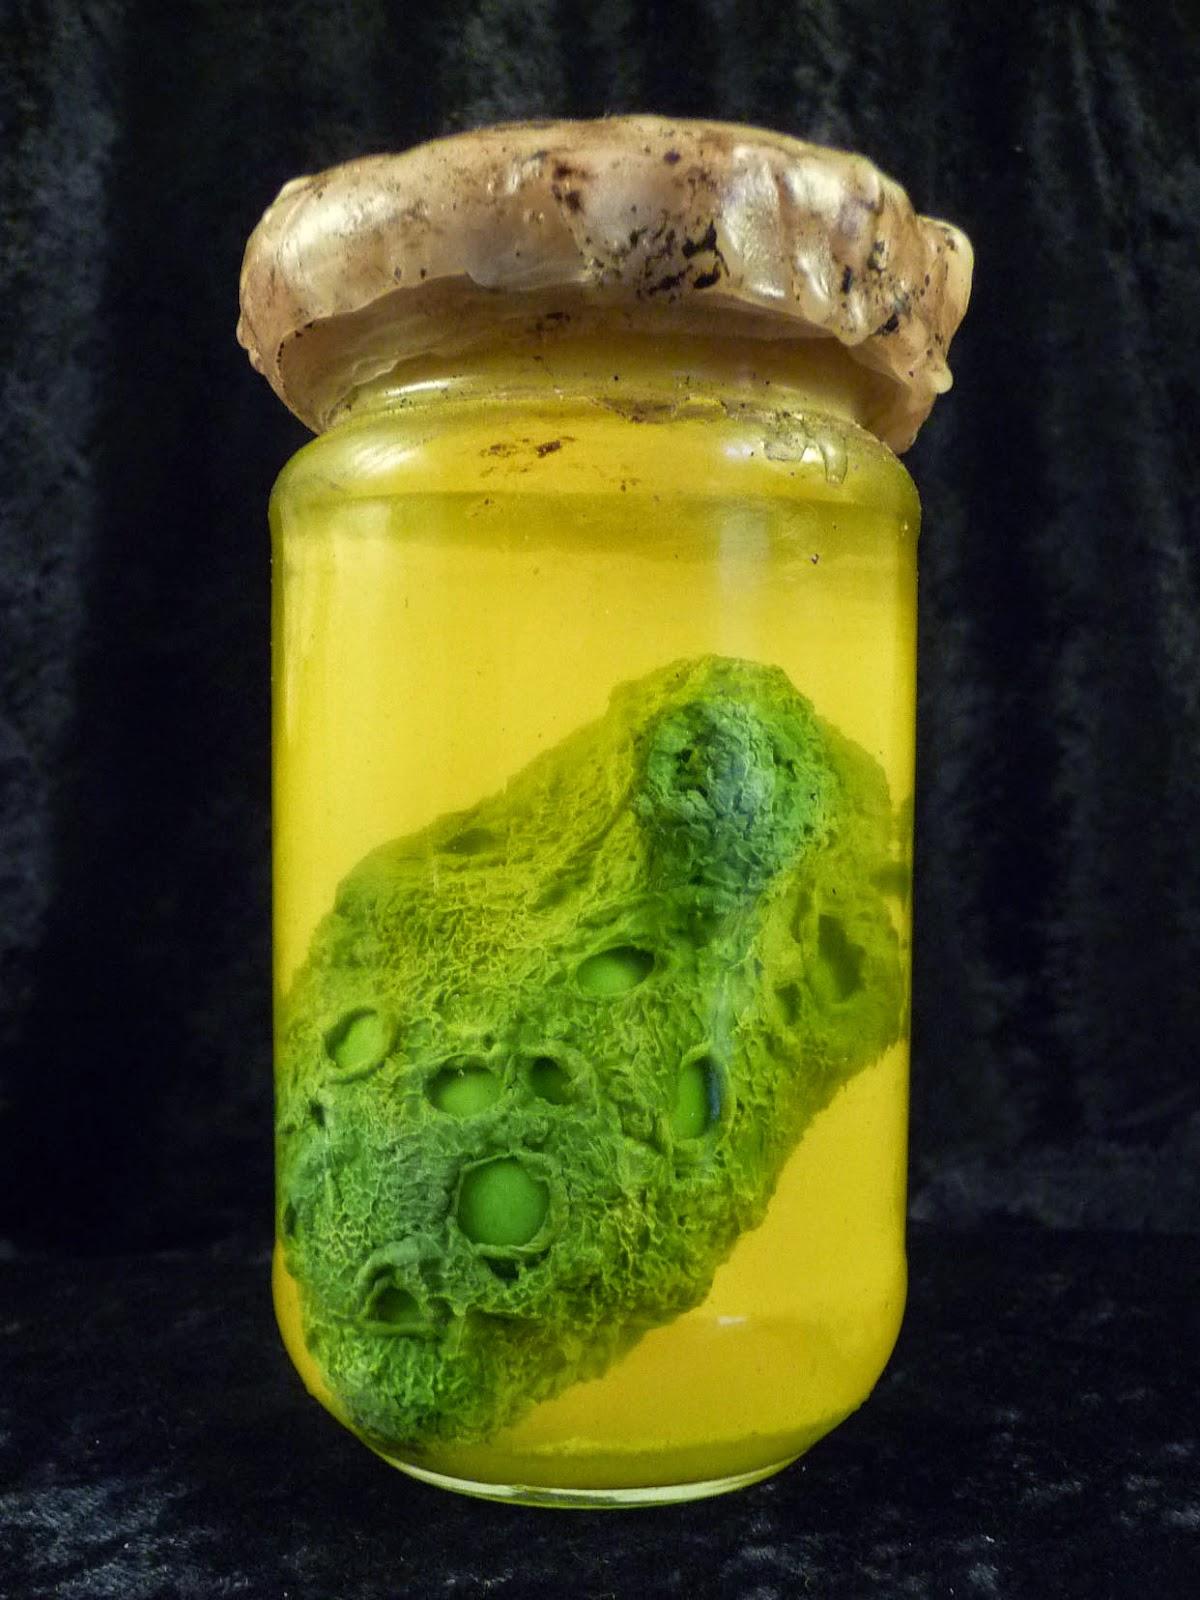 Propnomicon Preserved Tissue Specimen Tutorial